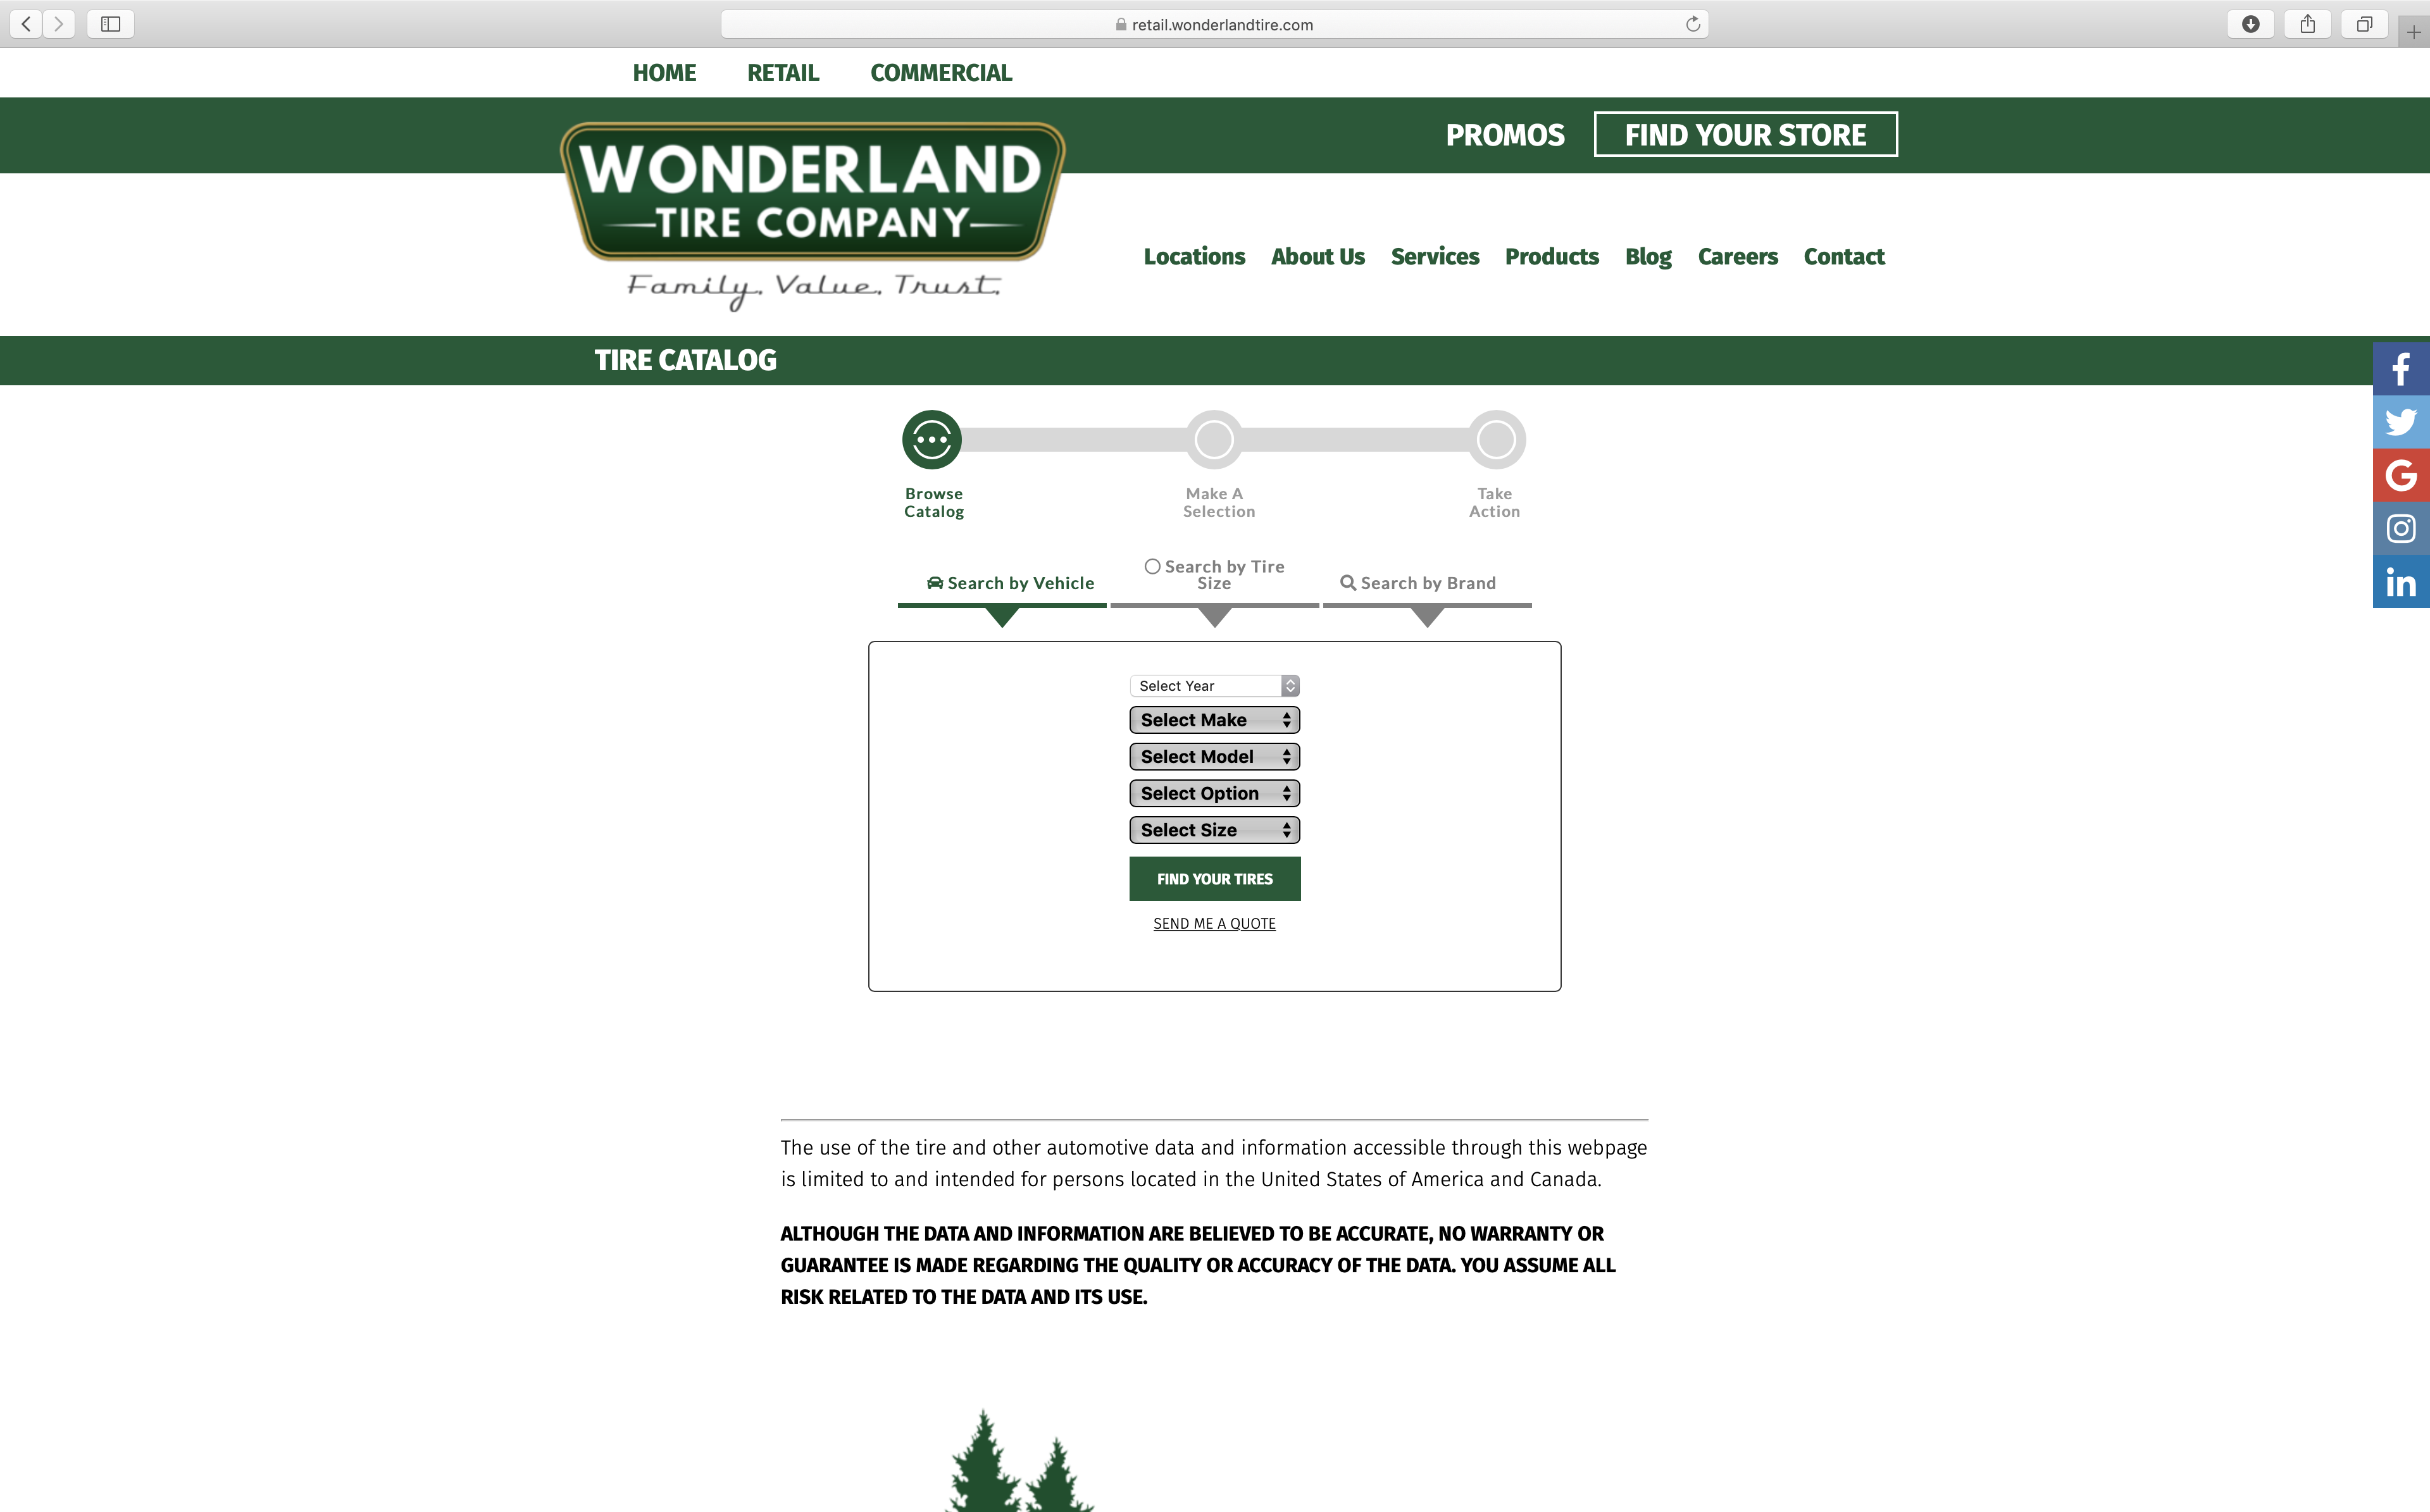 online tire catalog on wonderland tire website design